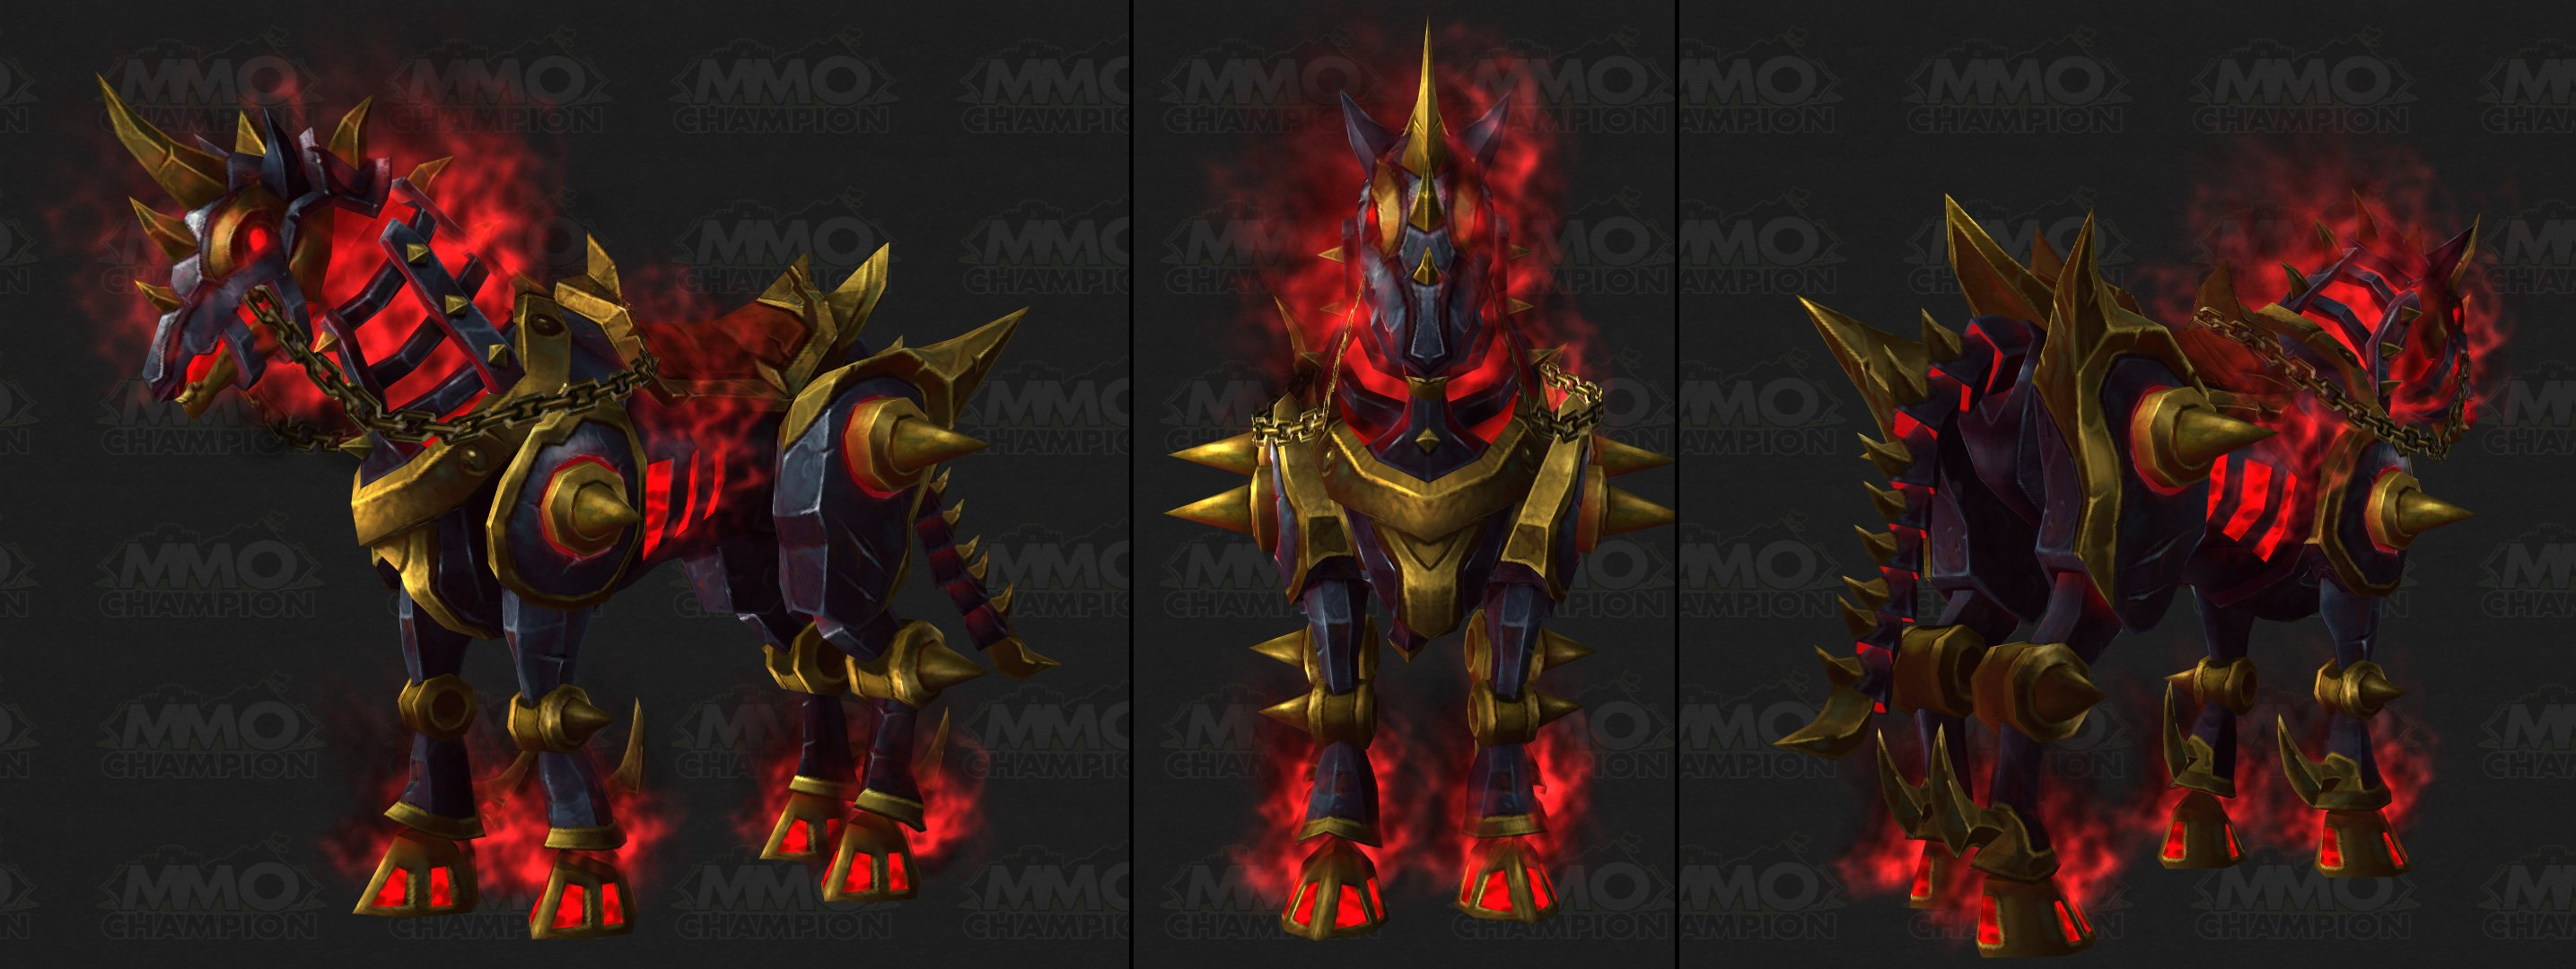 Melee Build Demon Hunter Diablo